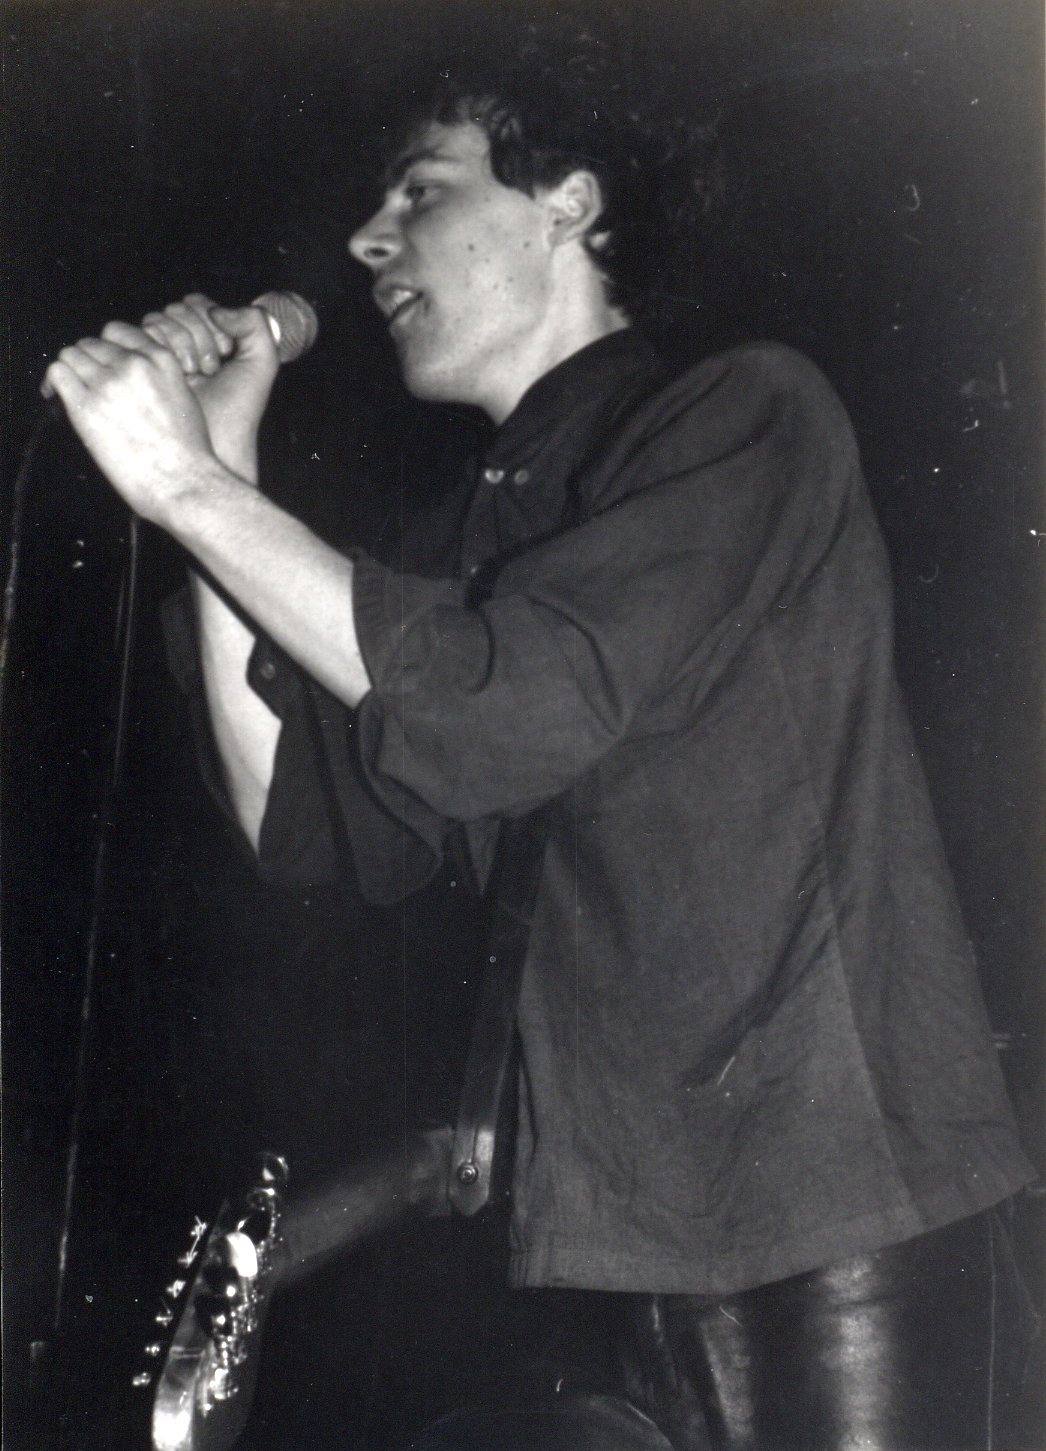 1985-04-05 a